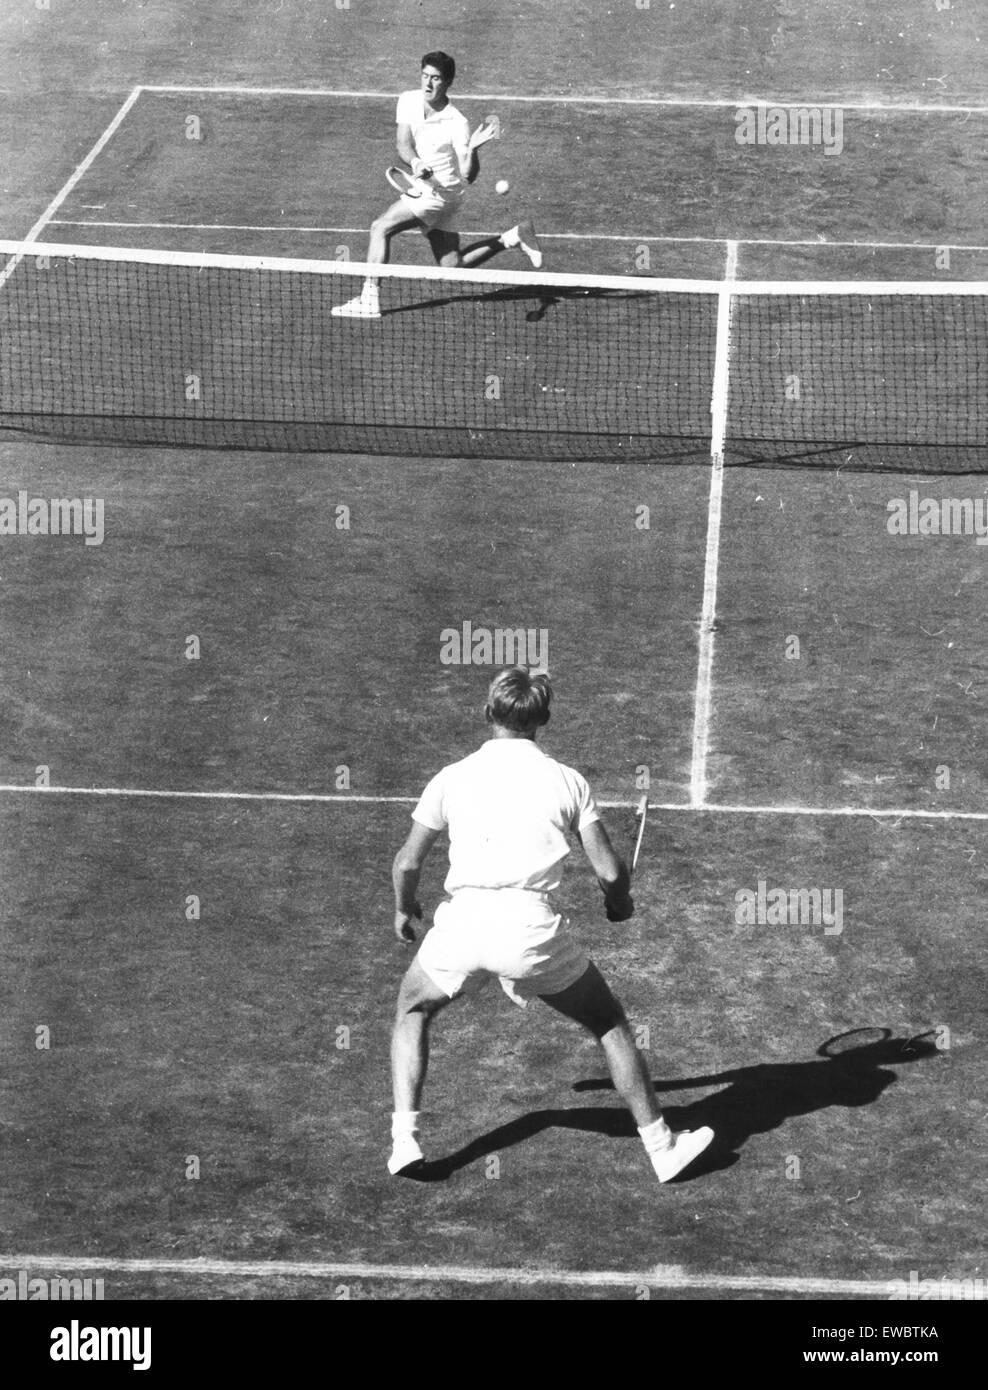 ken rosewall,1956 - Stock Image